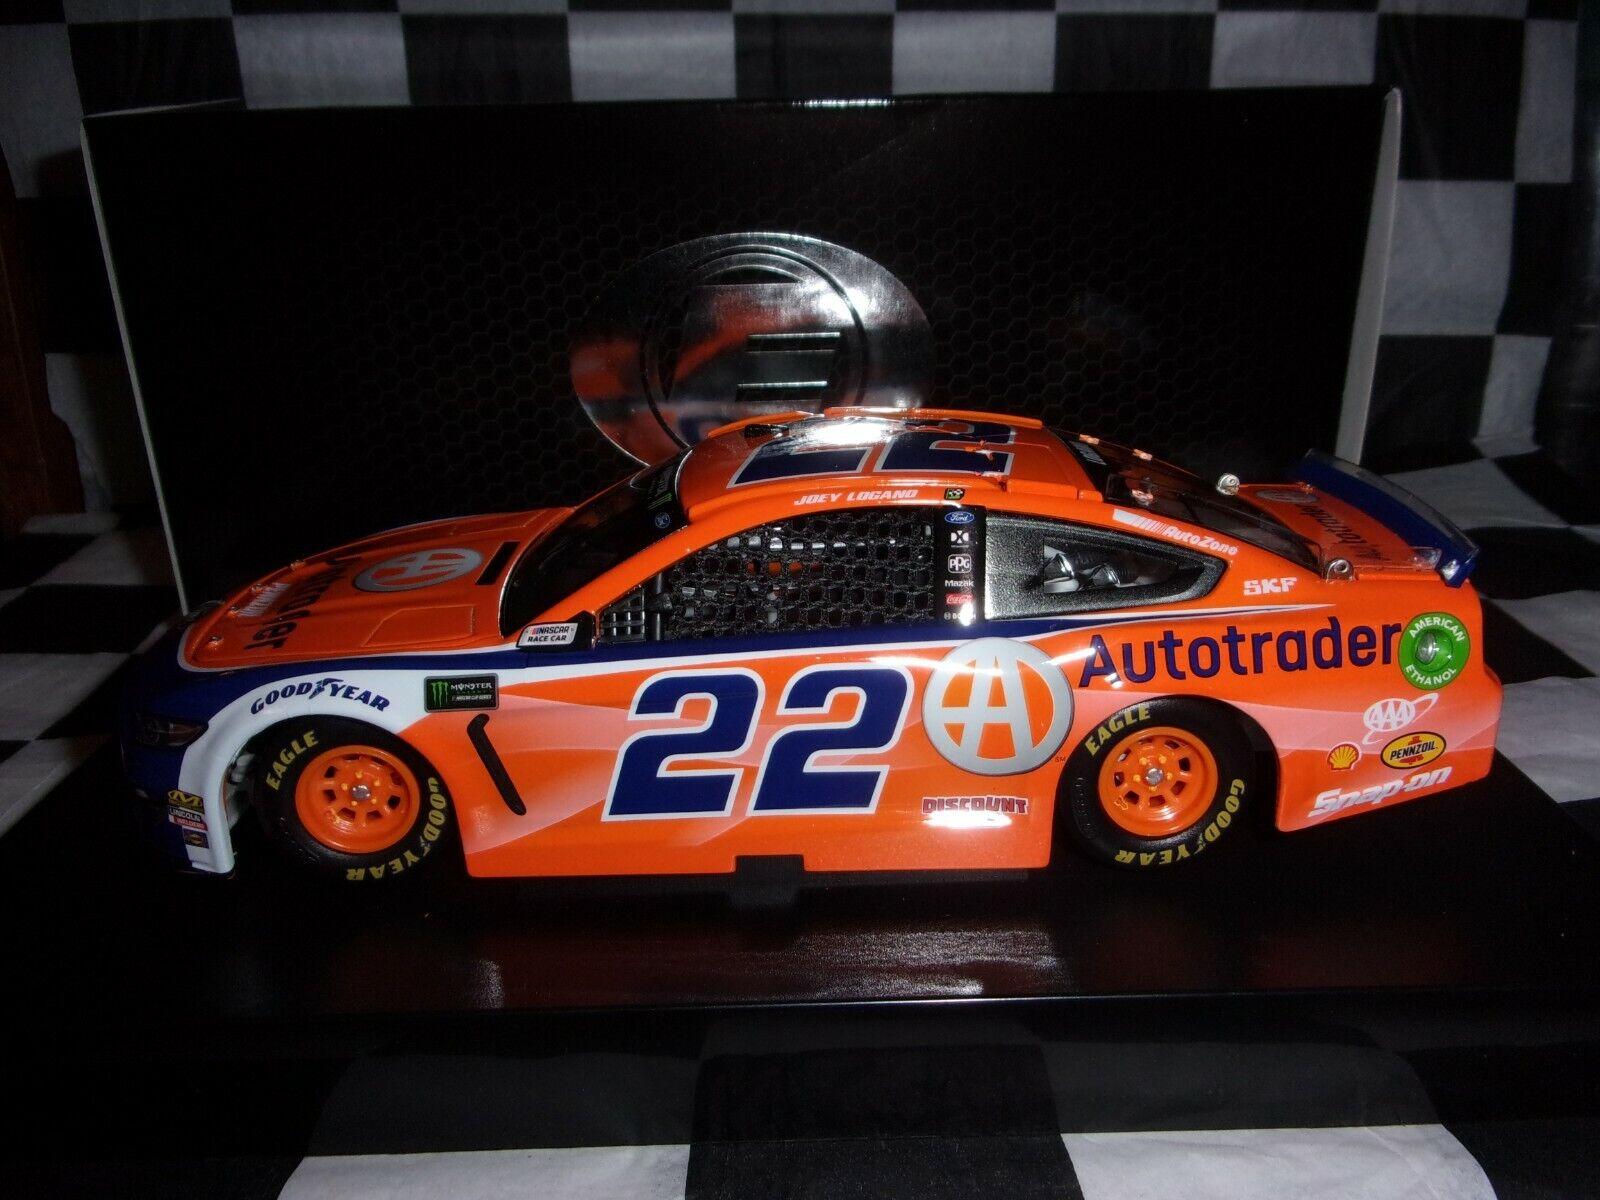 Joey Logano  22 AutoTrader 2019 Mustang Wirkung 1 24 ELITE NASCAR C221922A9JL  24